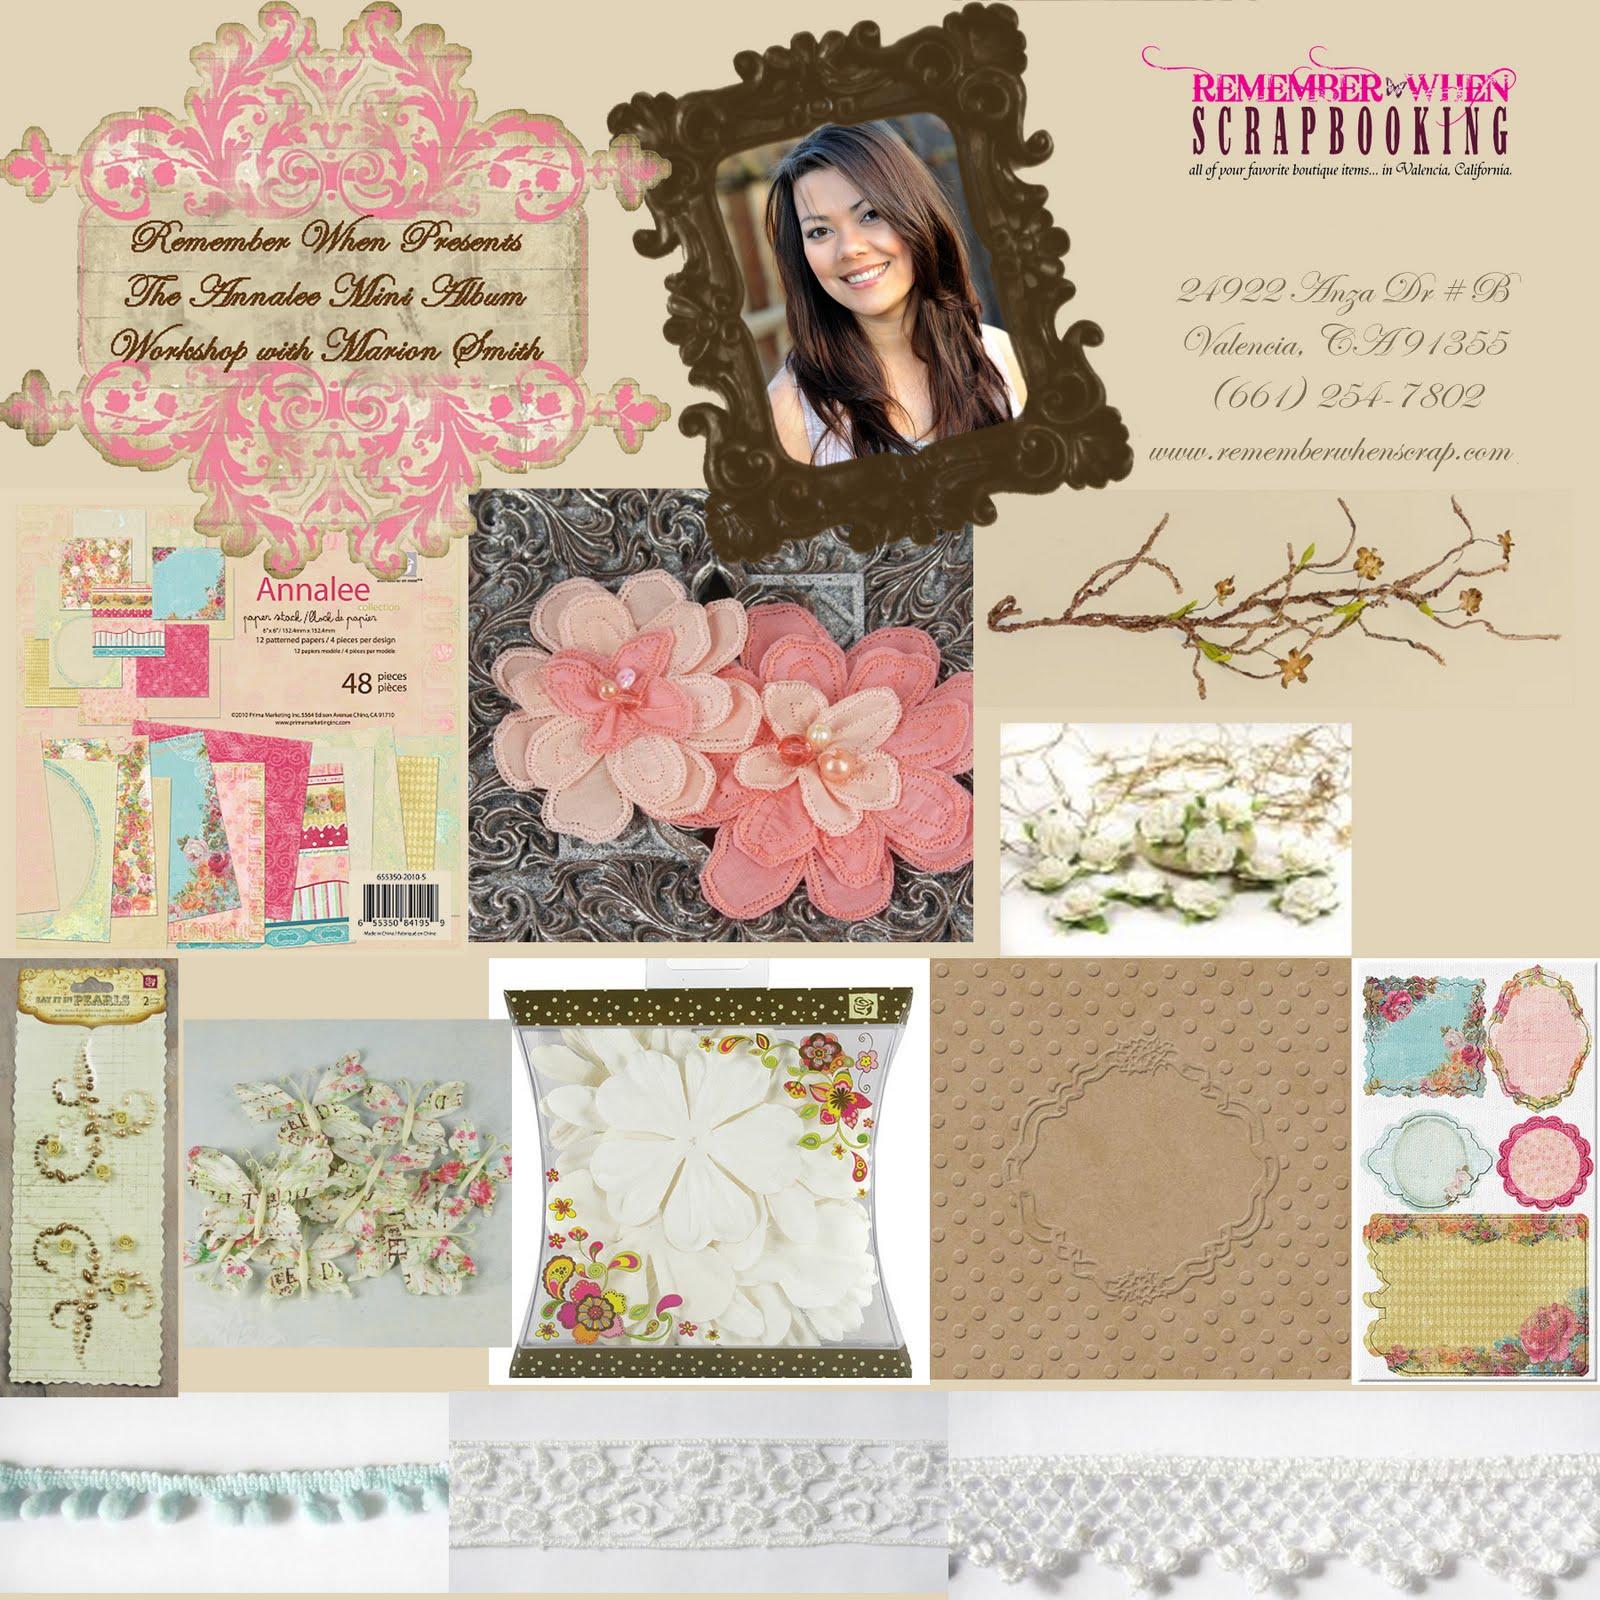 http://3.bp.blogspot.com/_-v44zUUtn3o/TEAJetNiwZI/AAAAAAAAAek/hFuVF8HwAm4/s1600/annalee+kit.jpg